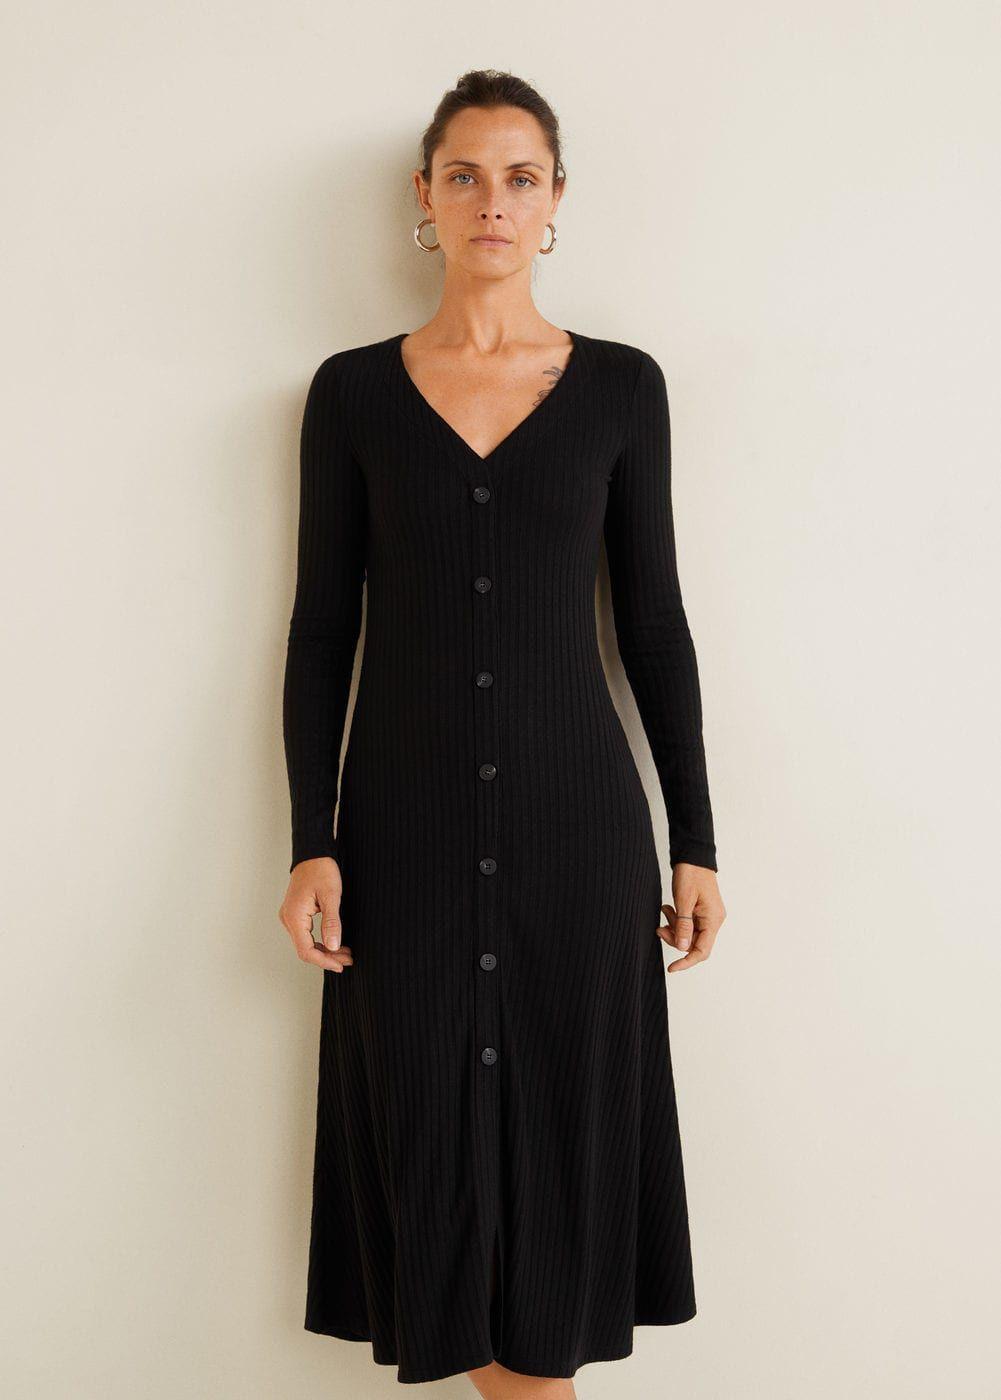 Heather Long Sleeve Button Front Dress Dresses Long Sleeve Dress Button Front Dress [ 1280 x 1007 Pixel ]